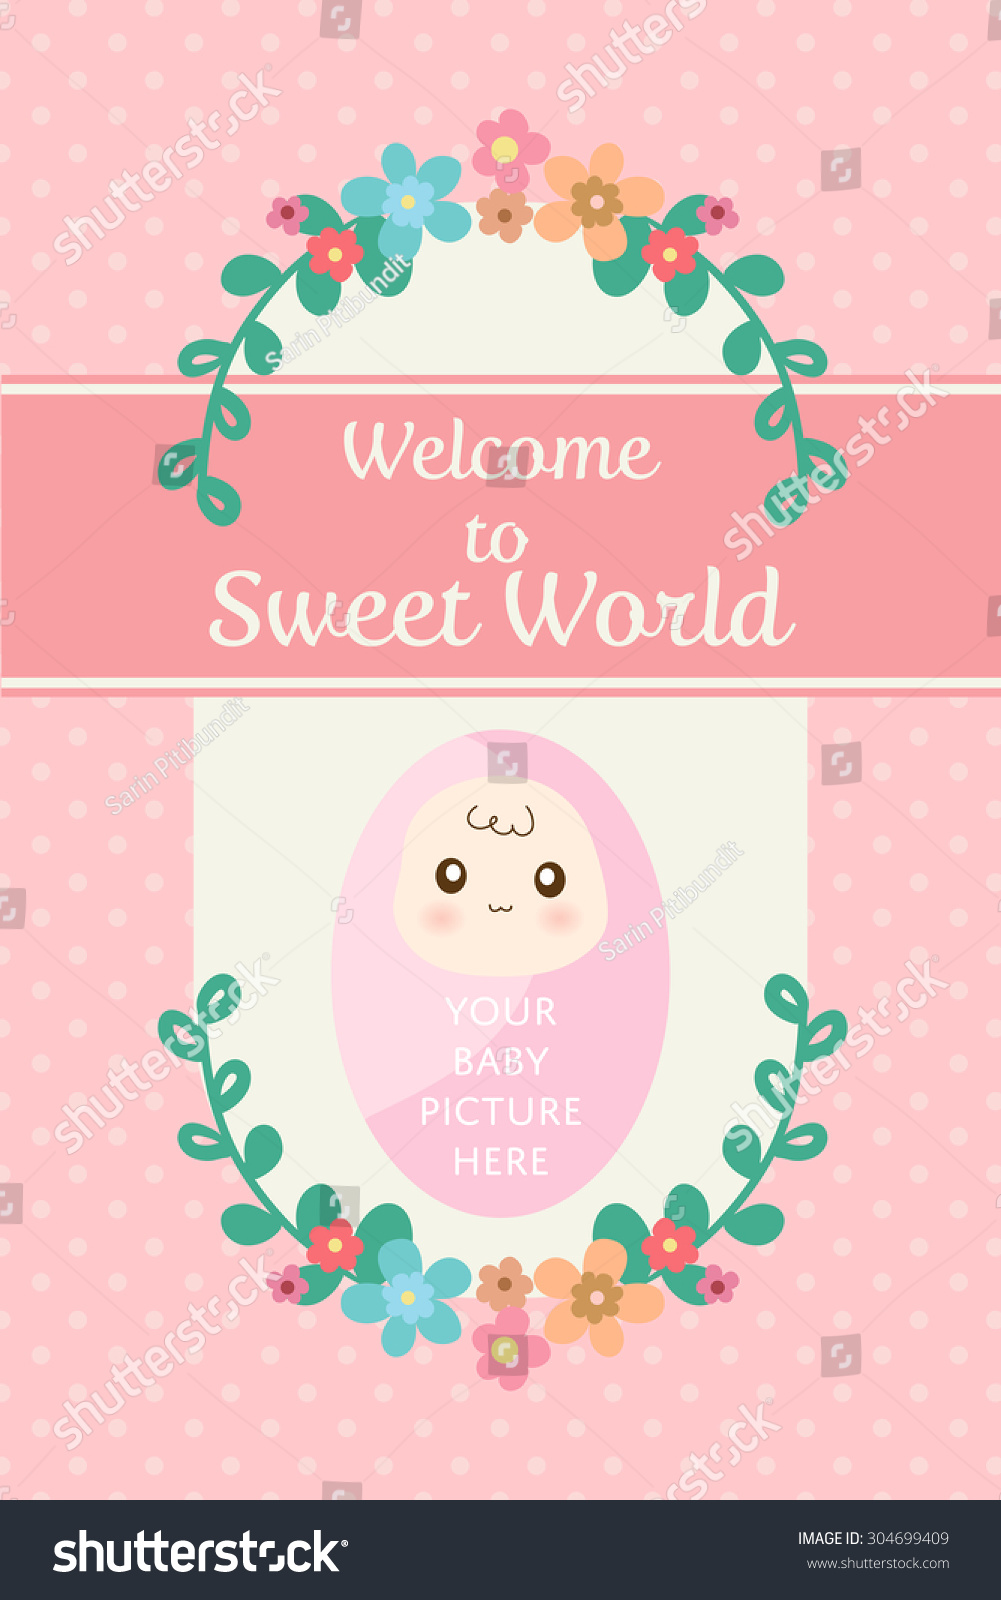 Cute pastel card new born baby stock vector 304699409 shutterstock cute pastel card for new born baby or infant congratulation or birth day celebration kristyandbryce Gallery